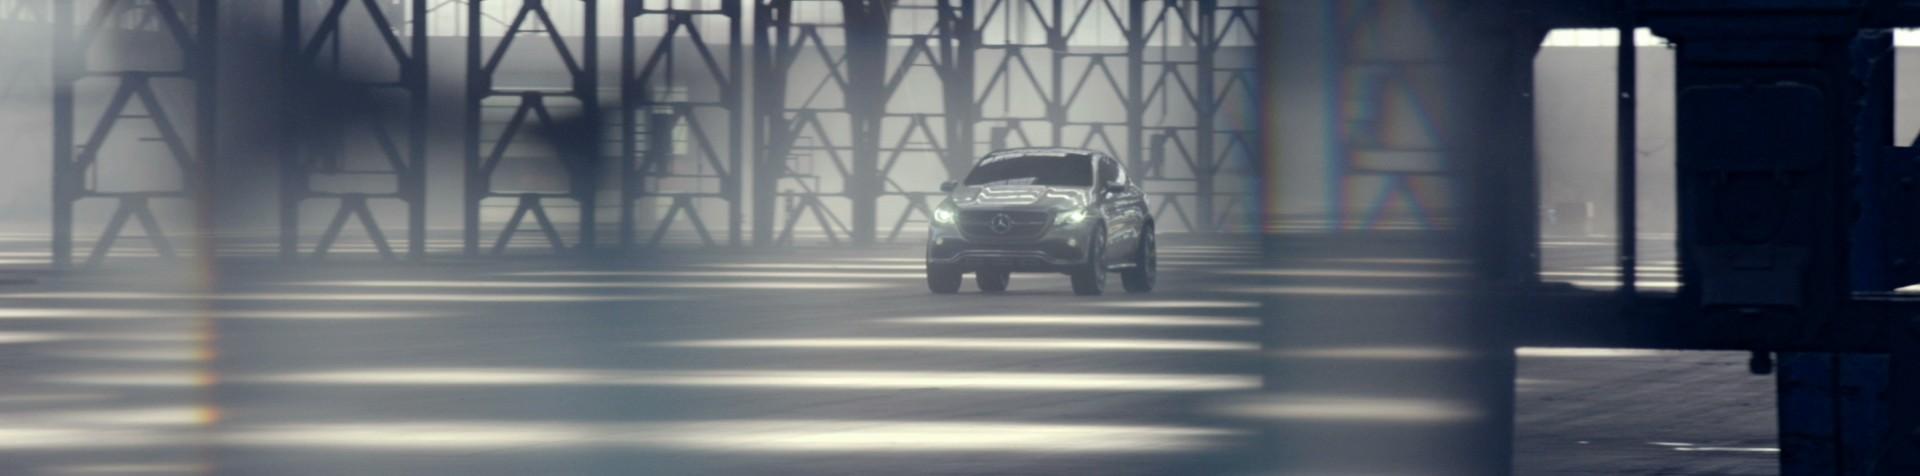 monomango Mercedes-Benz CONCEPT SUV